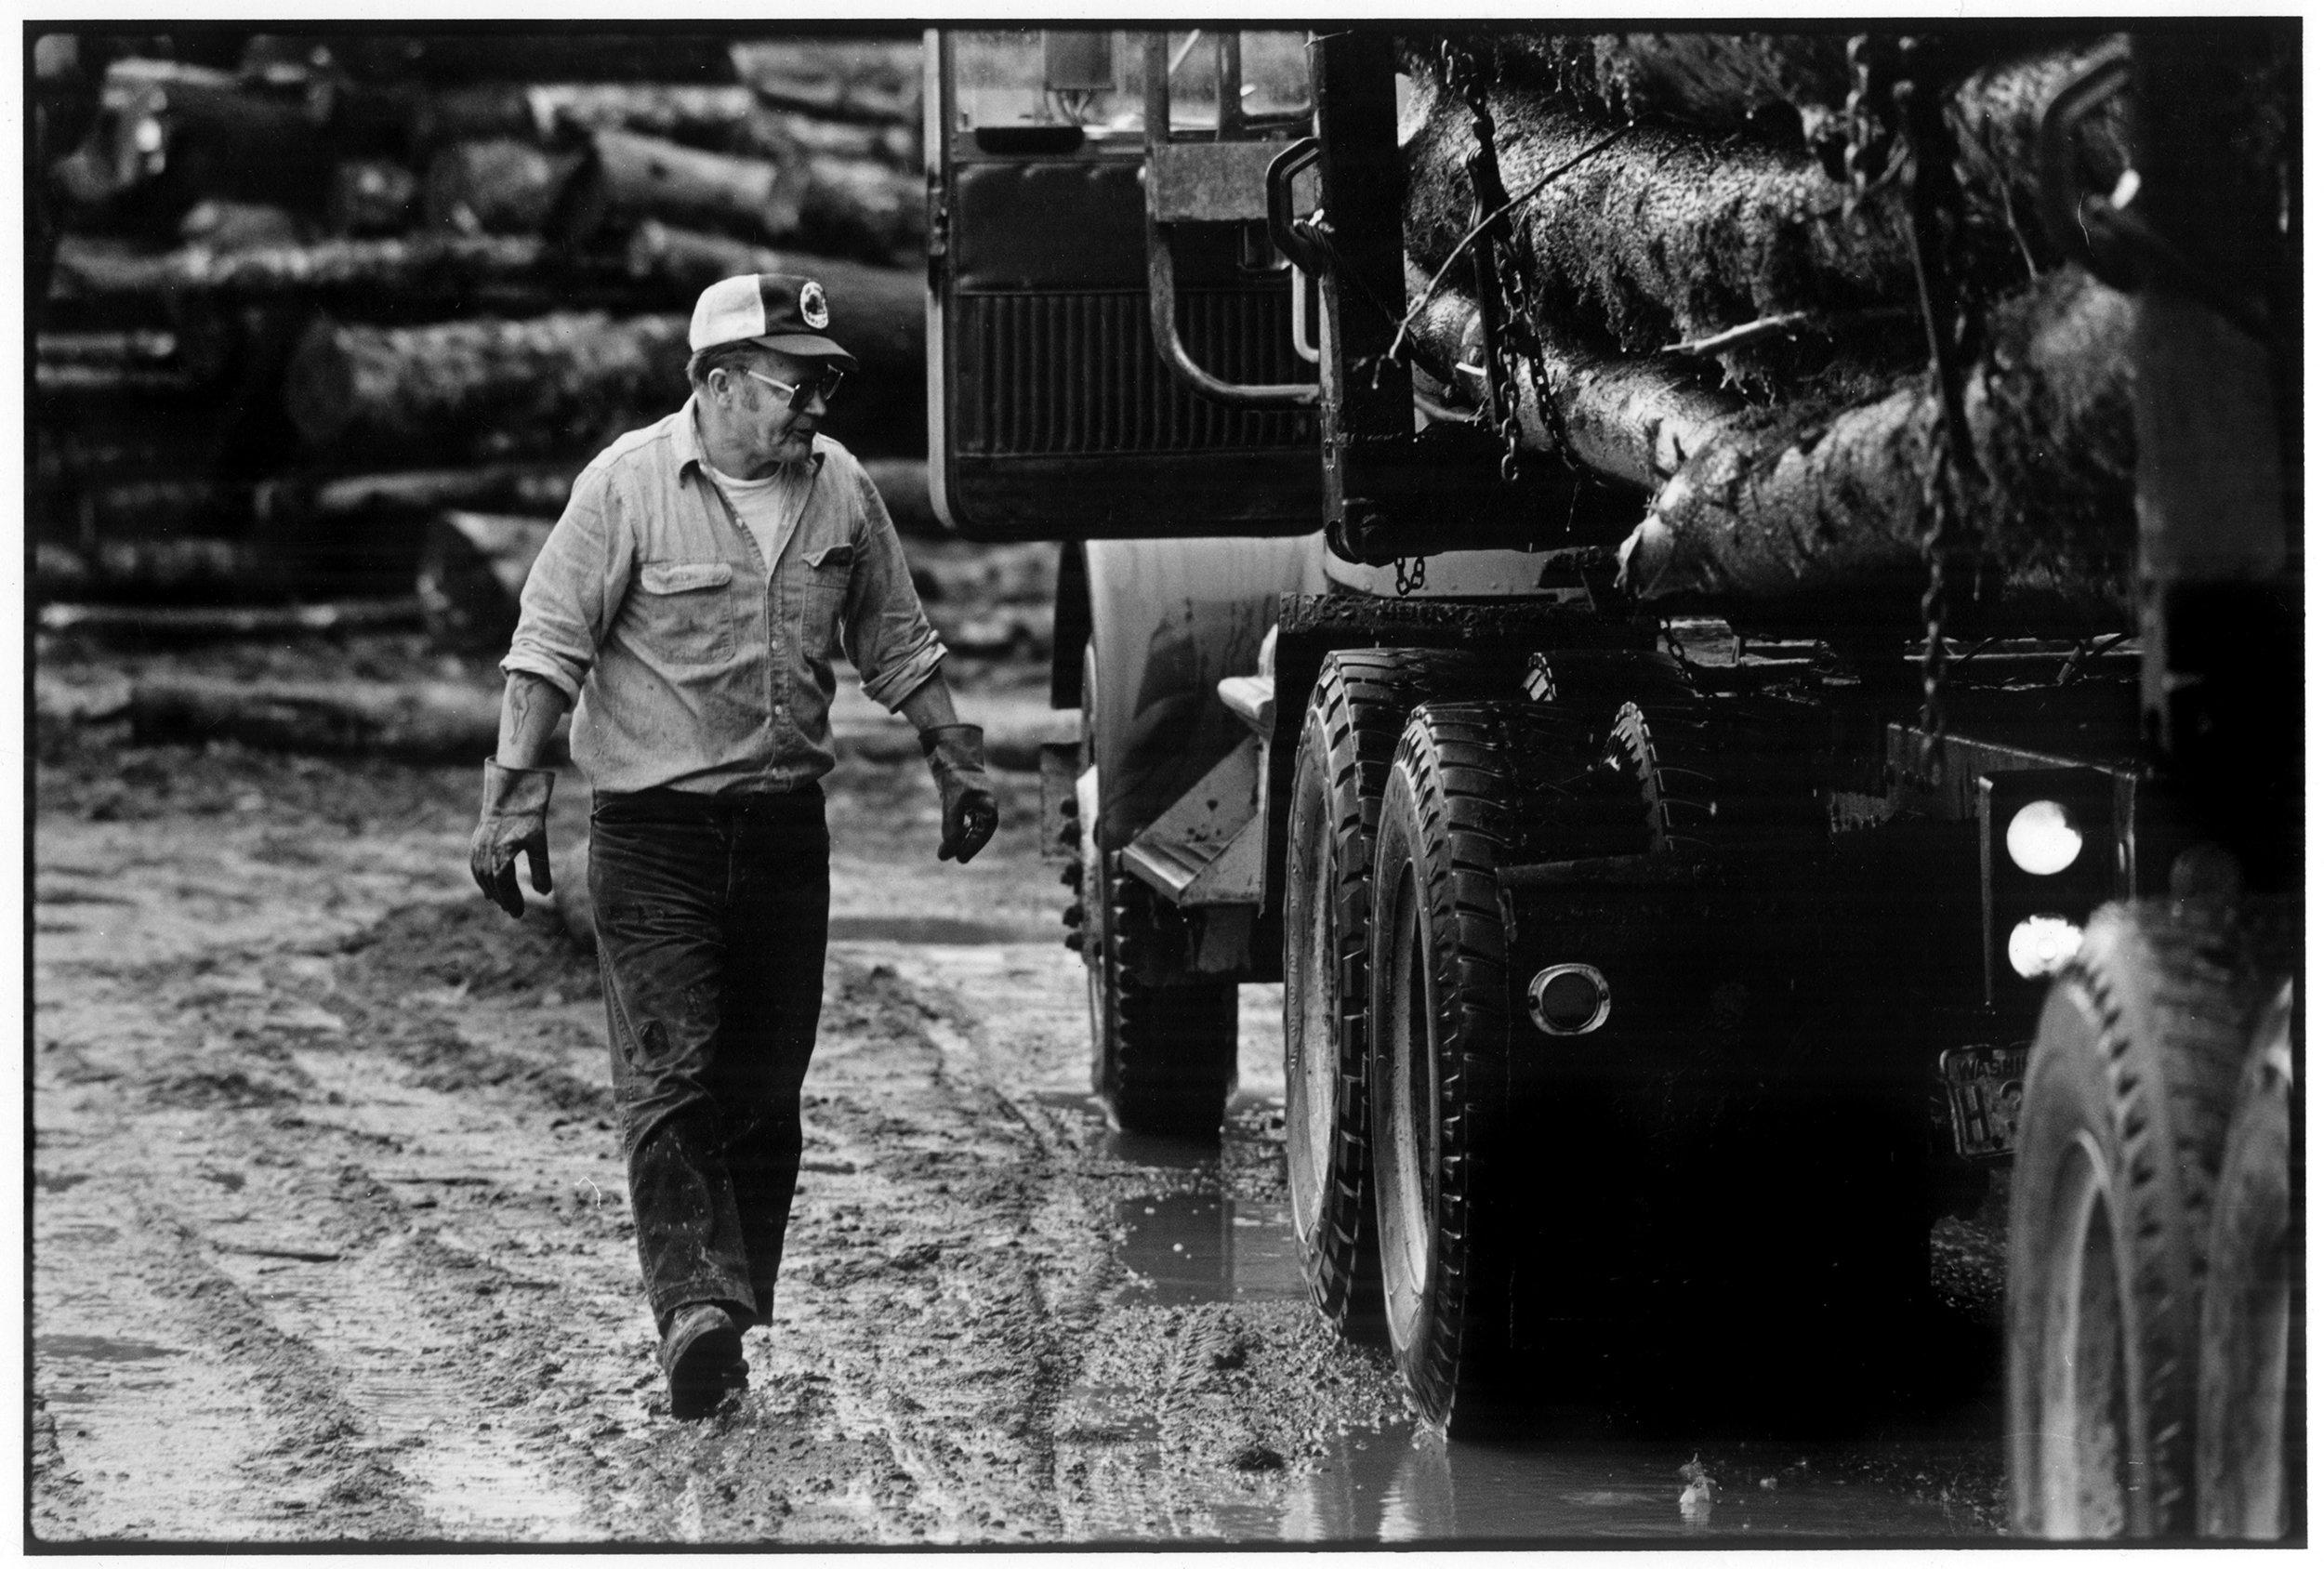 Timber Worker, Eureka, California, 1981_2633px.jpg